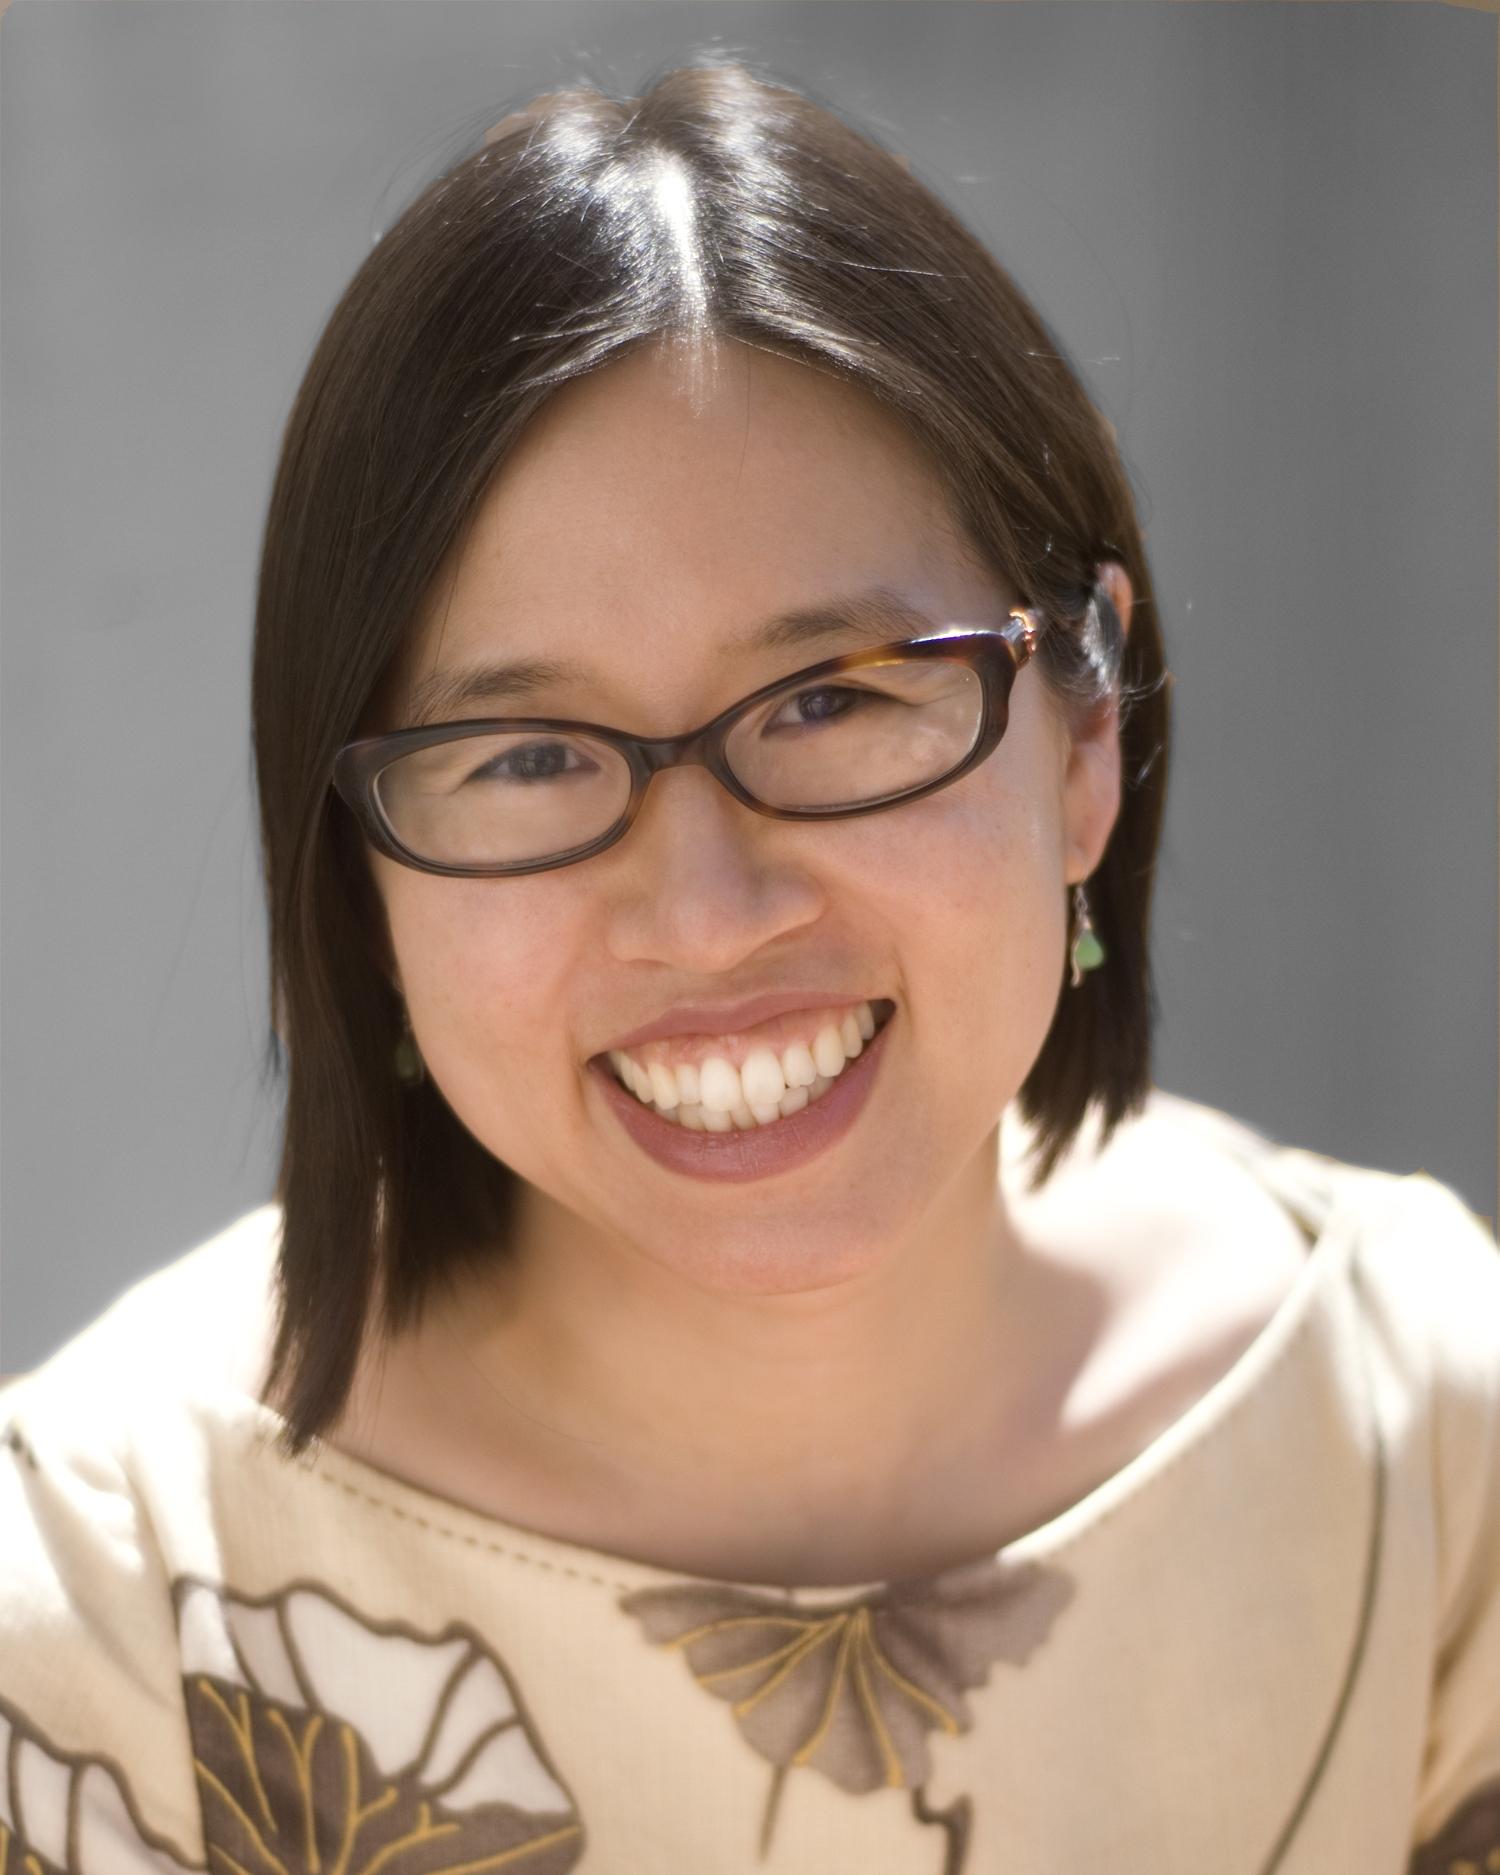 Author Grace Lin